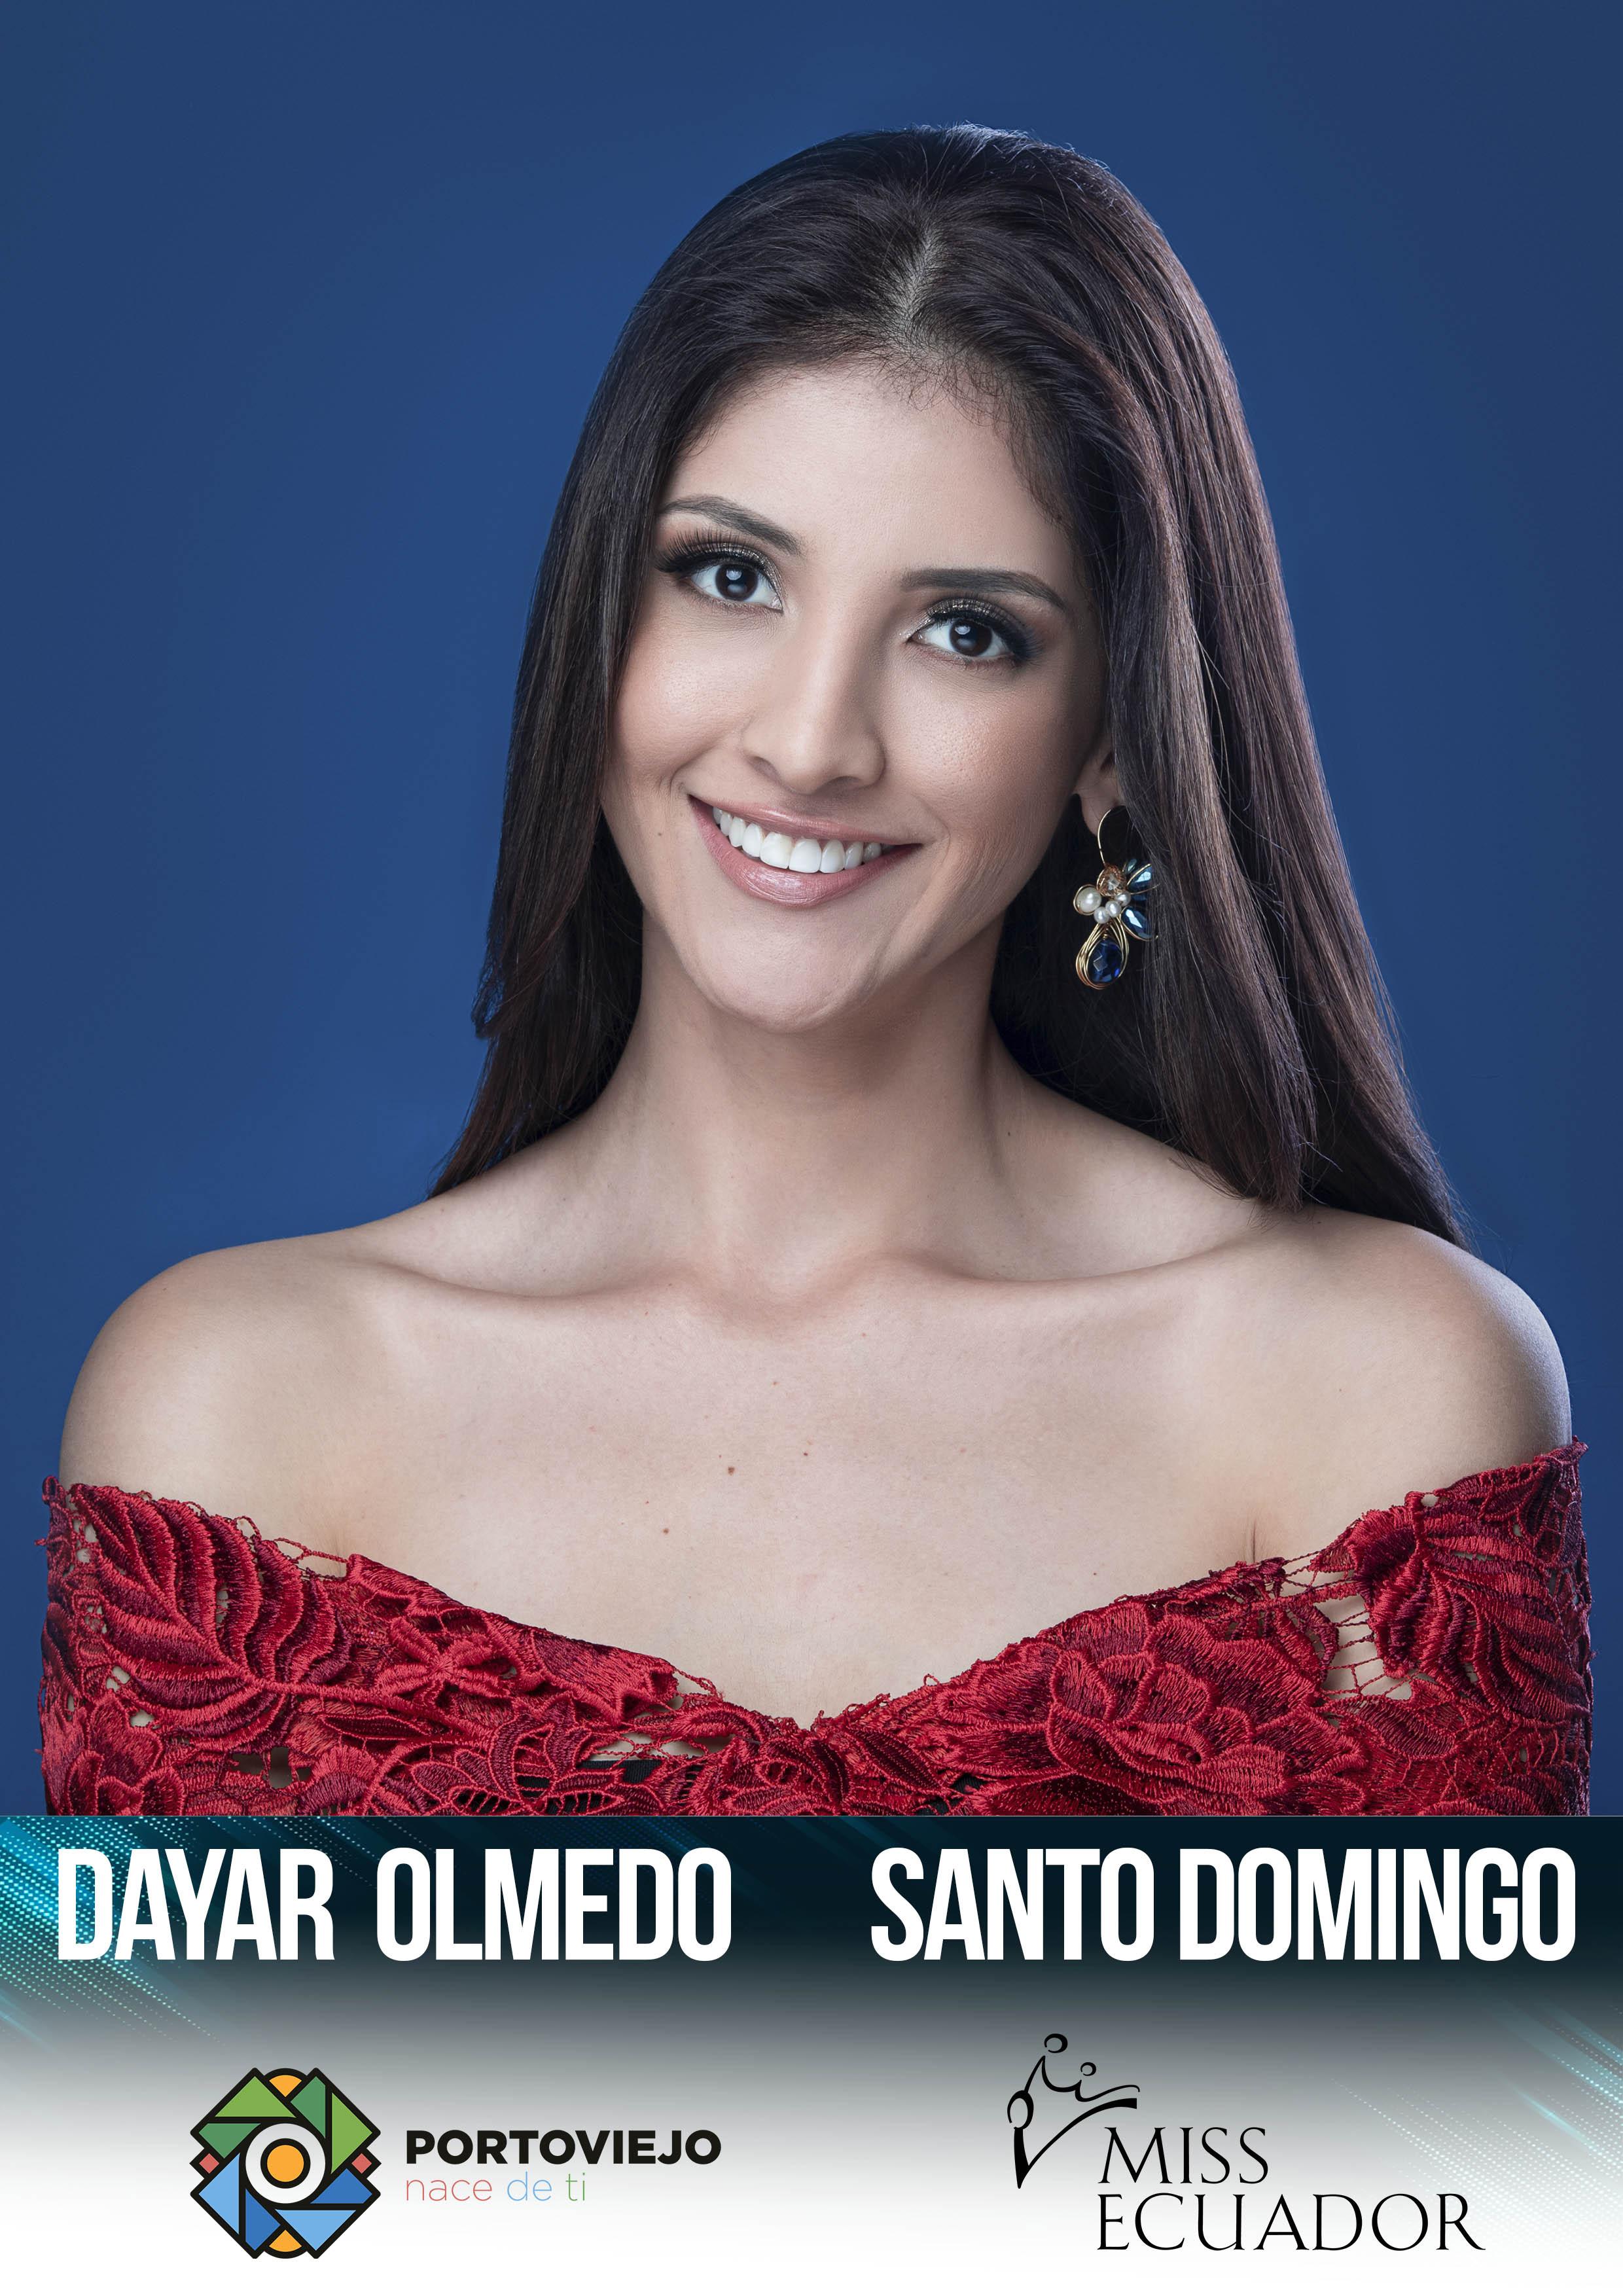 Miss Ecuador 2020 5-dayar_olmedo.2